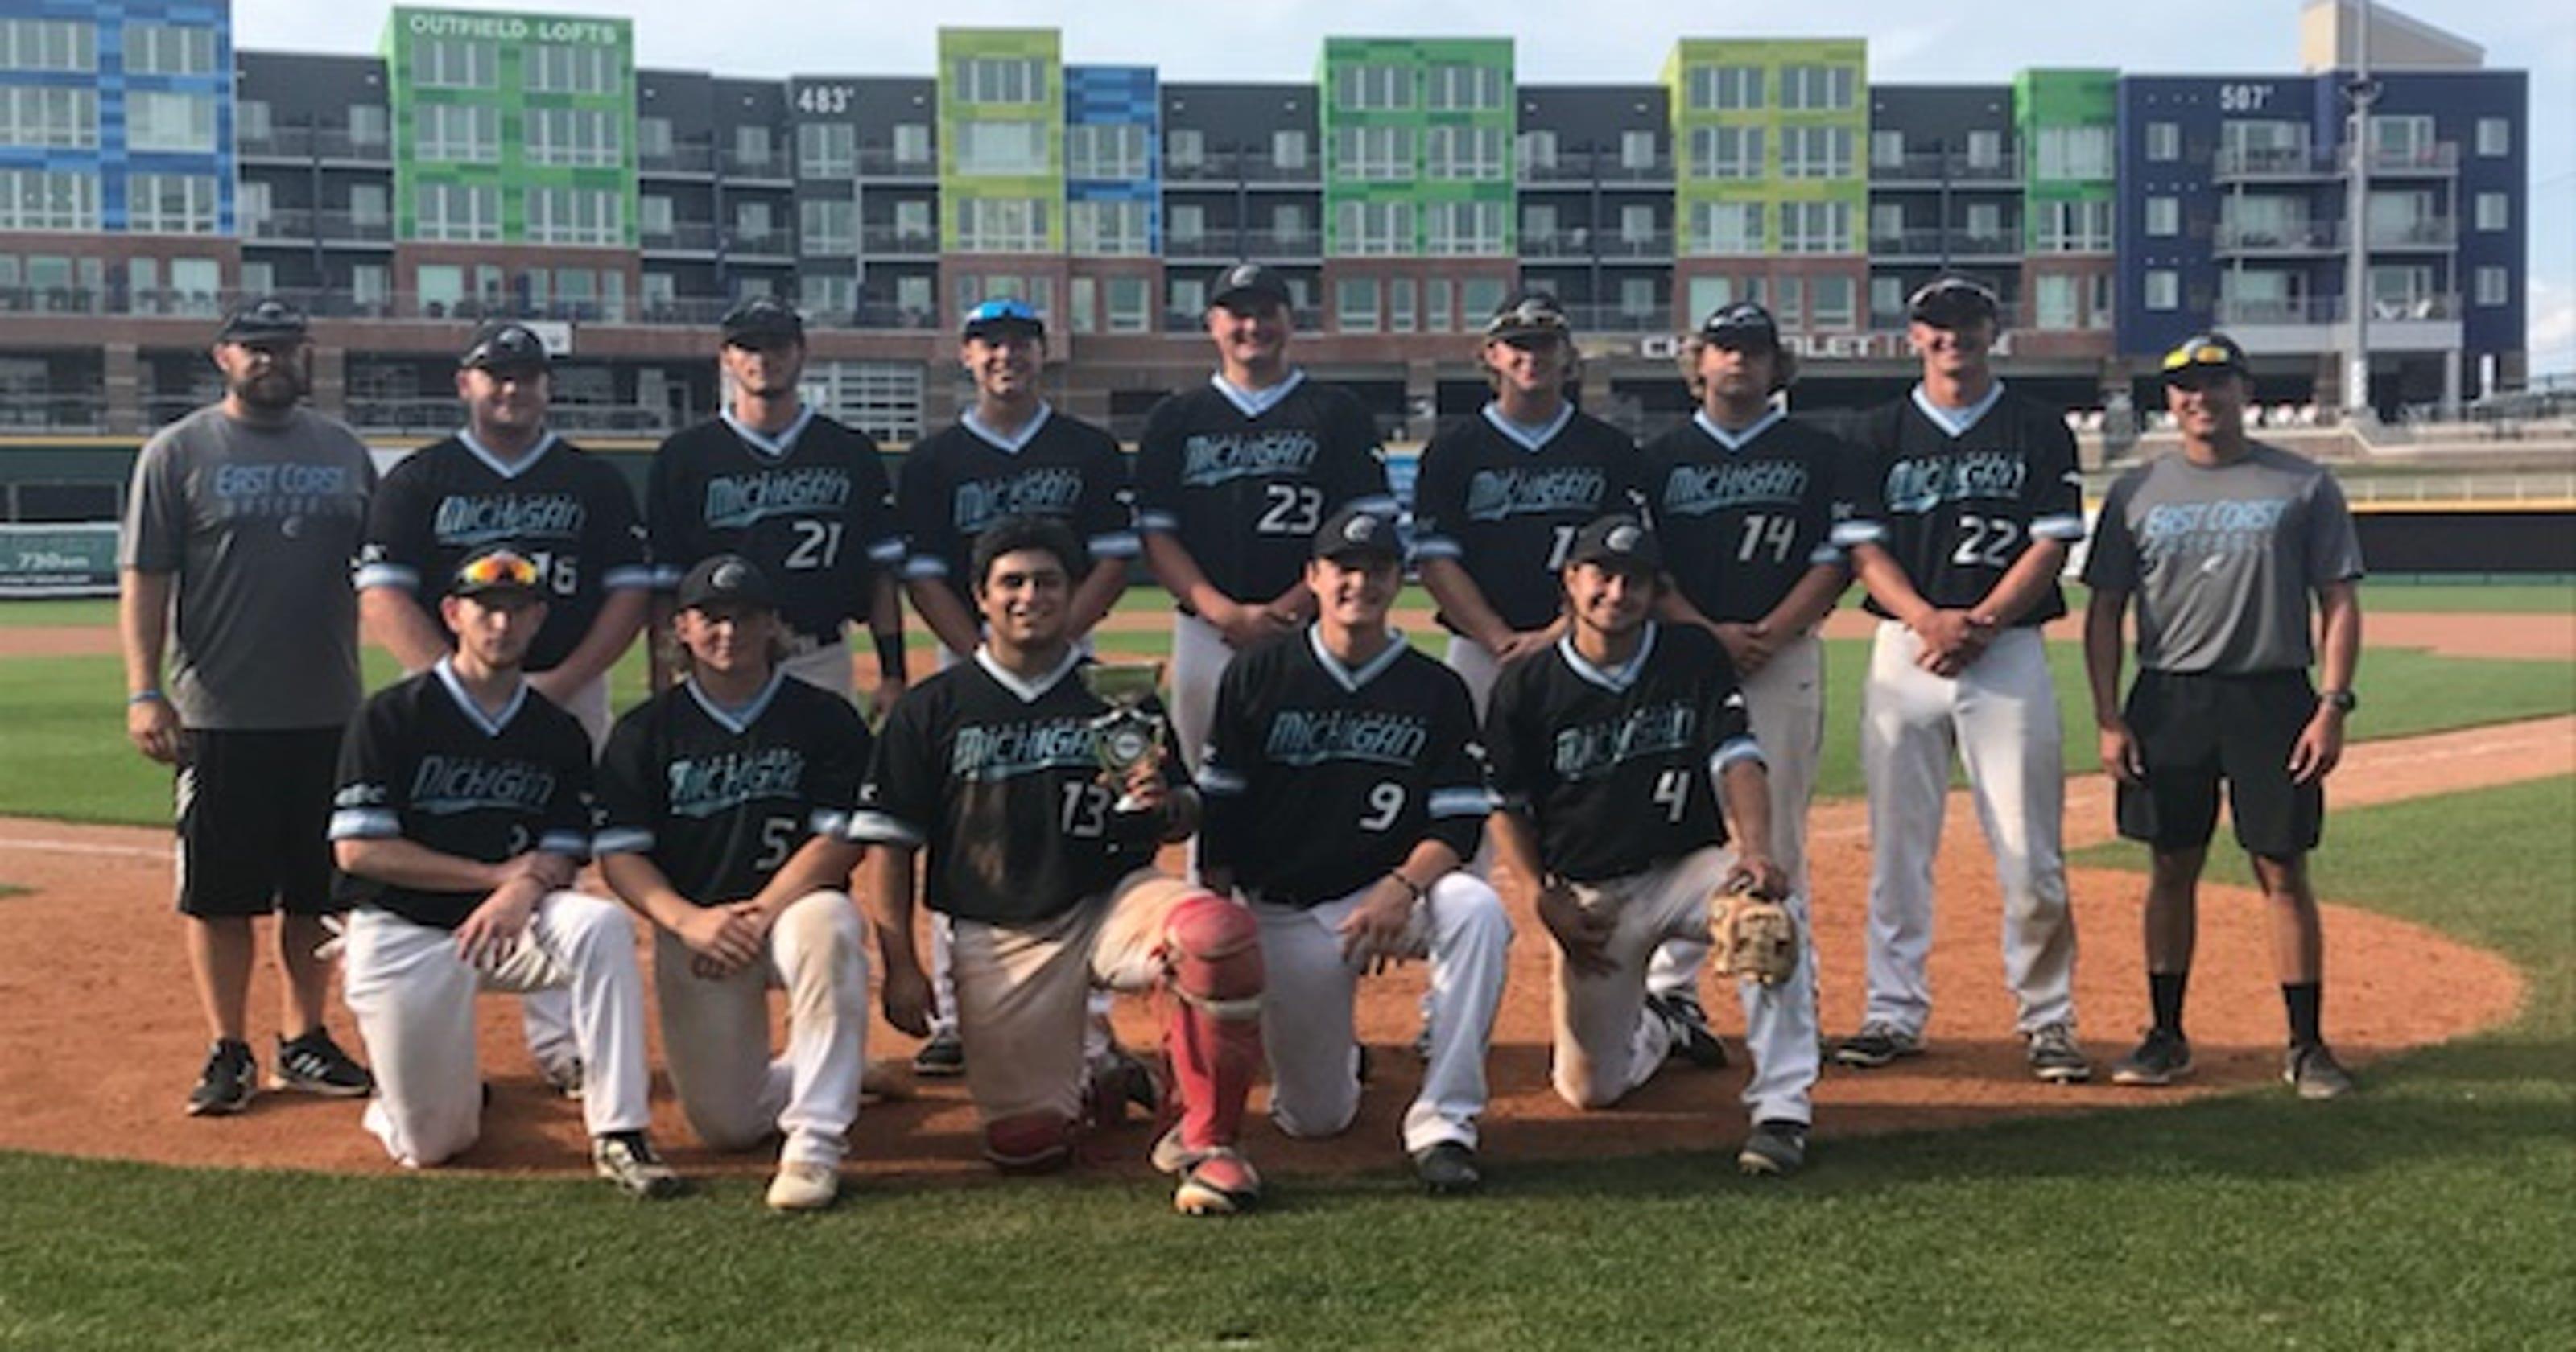 Local travel baseball team enjoys productive summer